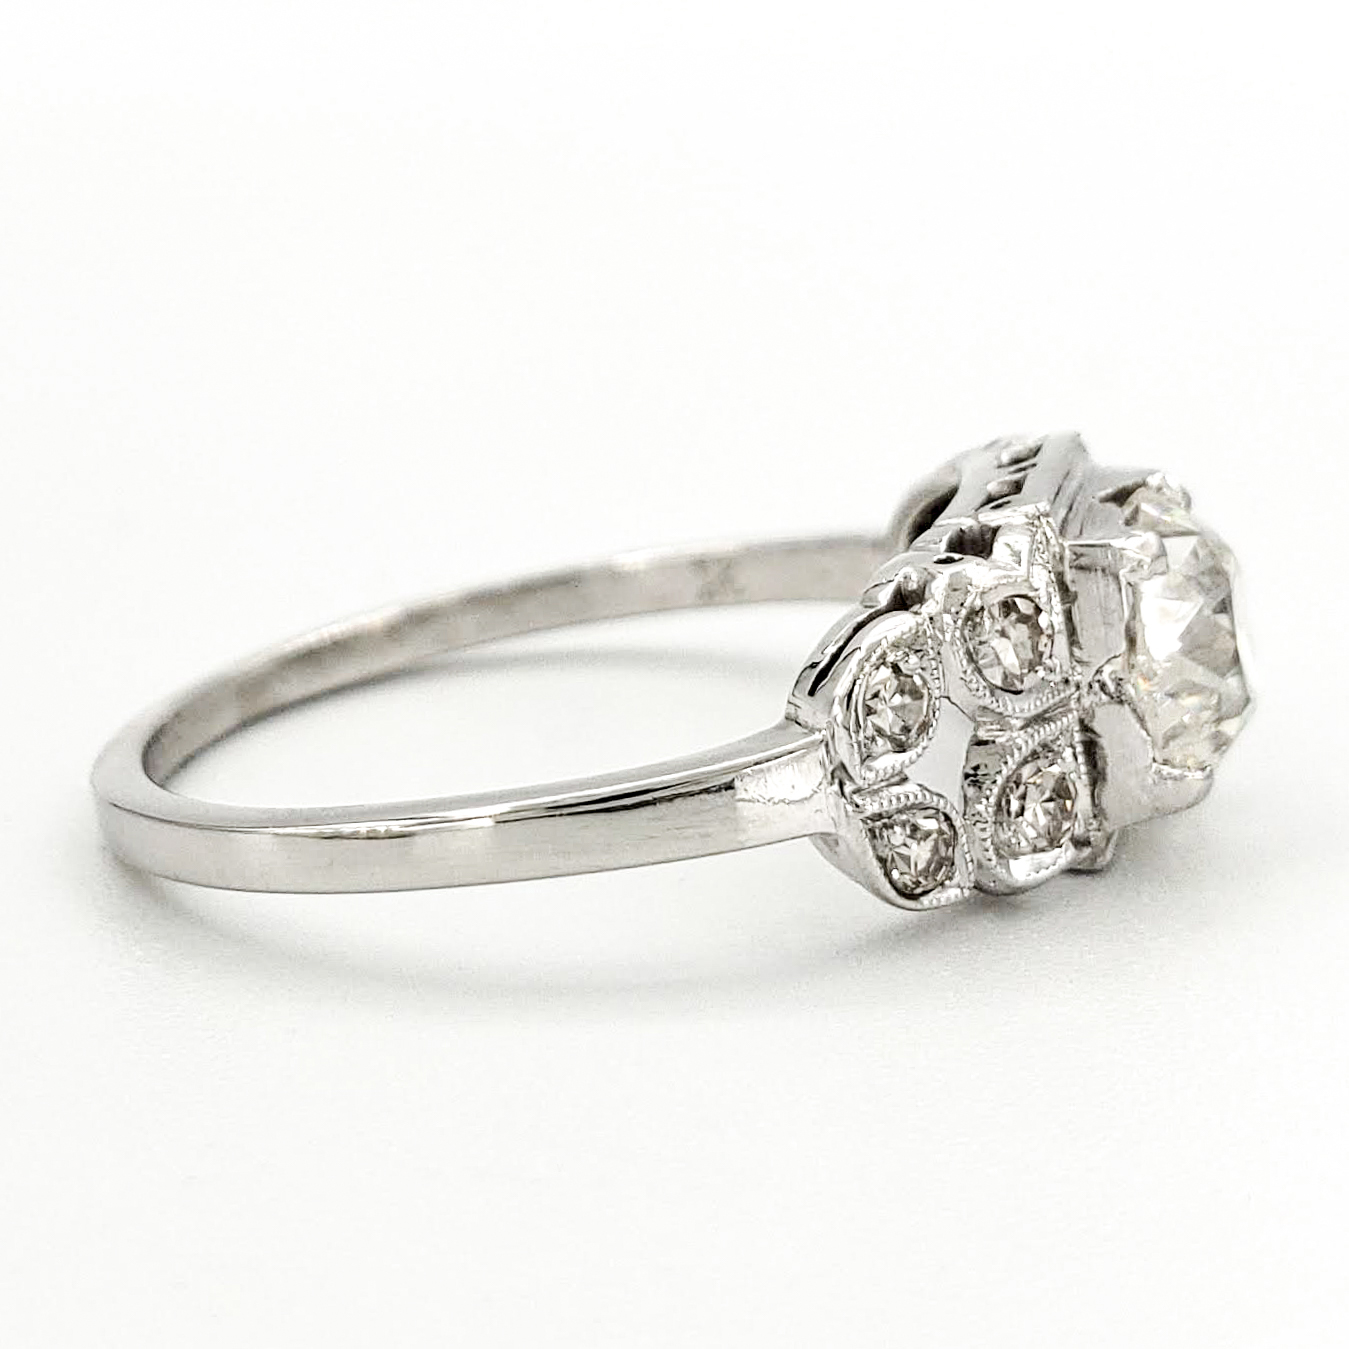 vintage-platinum-engagement-ring-with-1-01-carat-old-european-cut-diamond-egl-h-si1